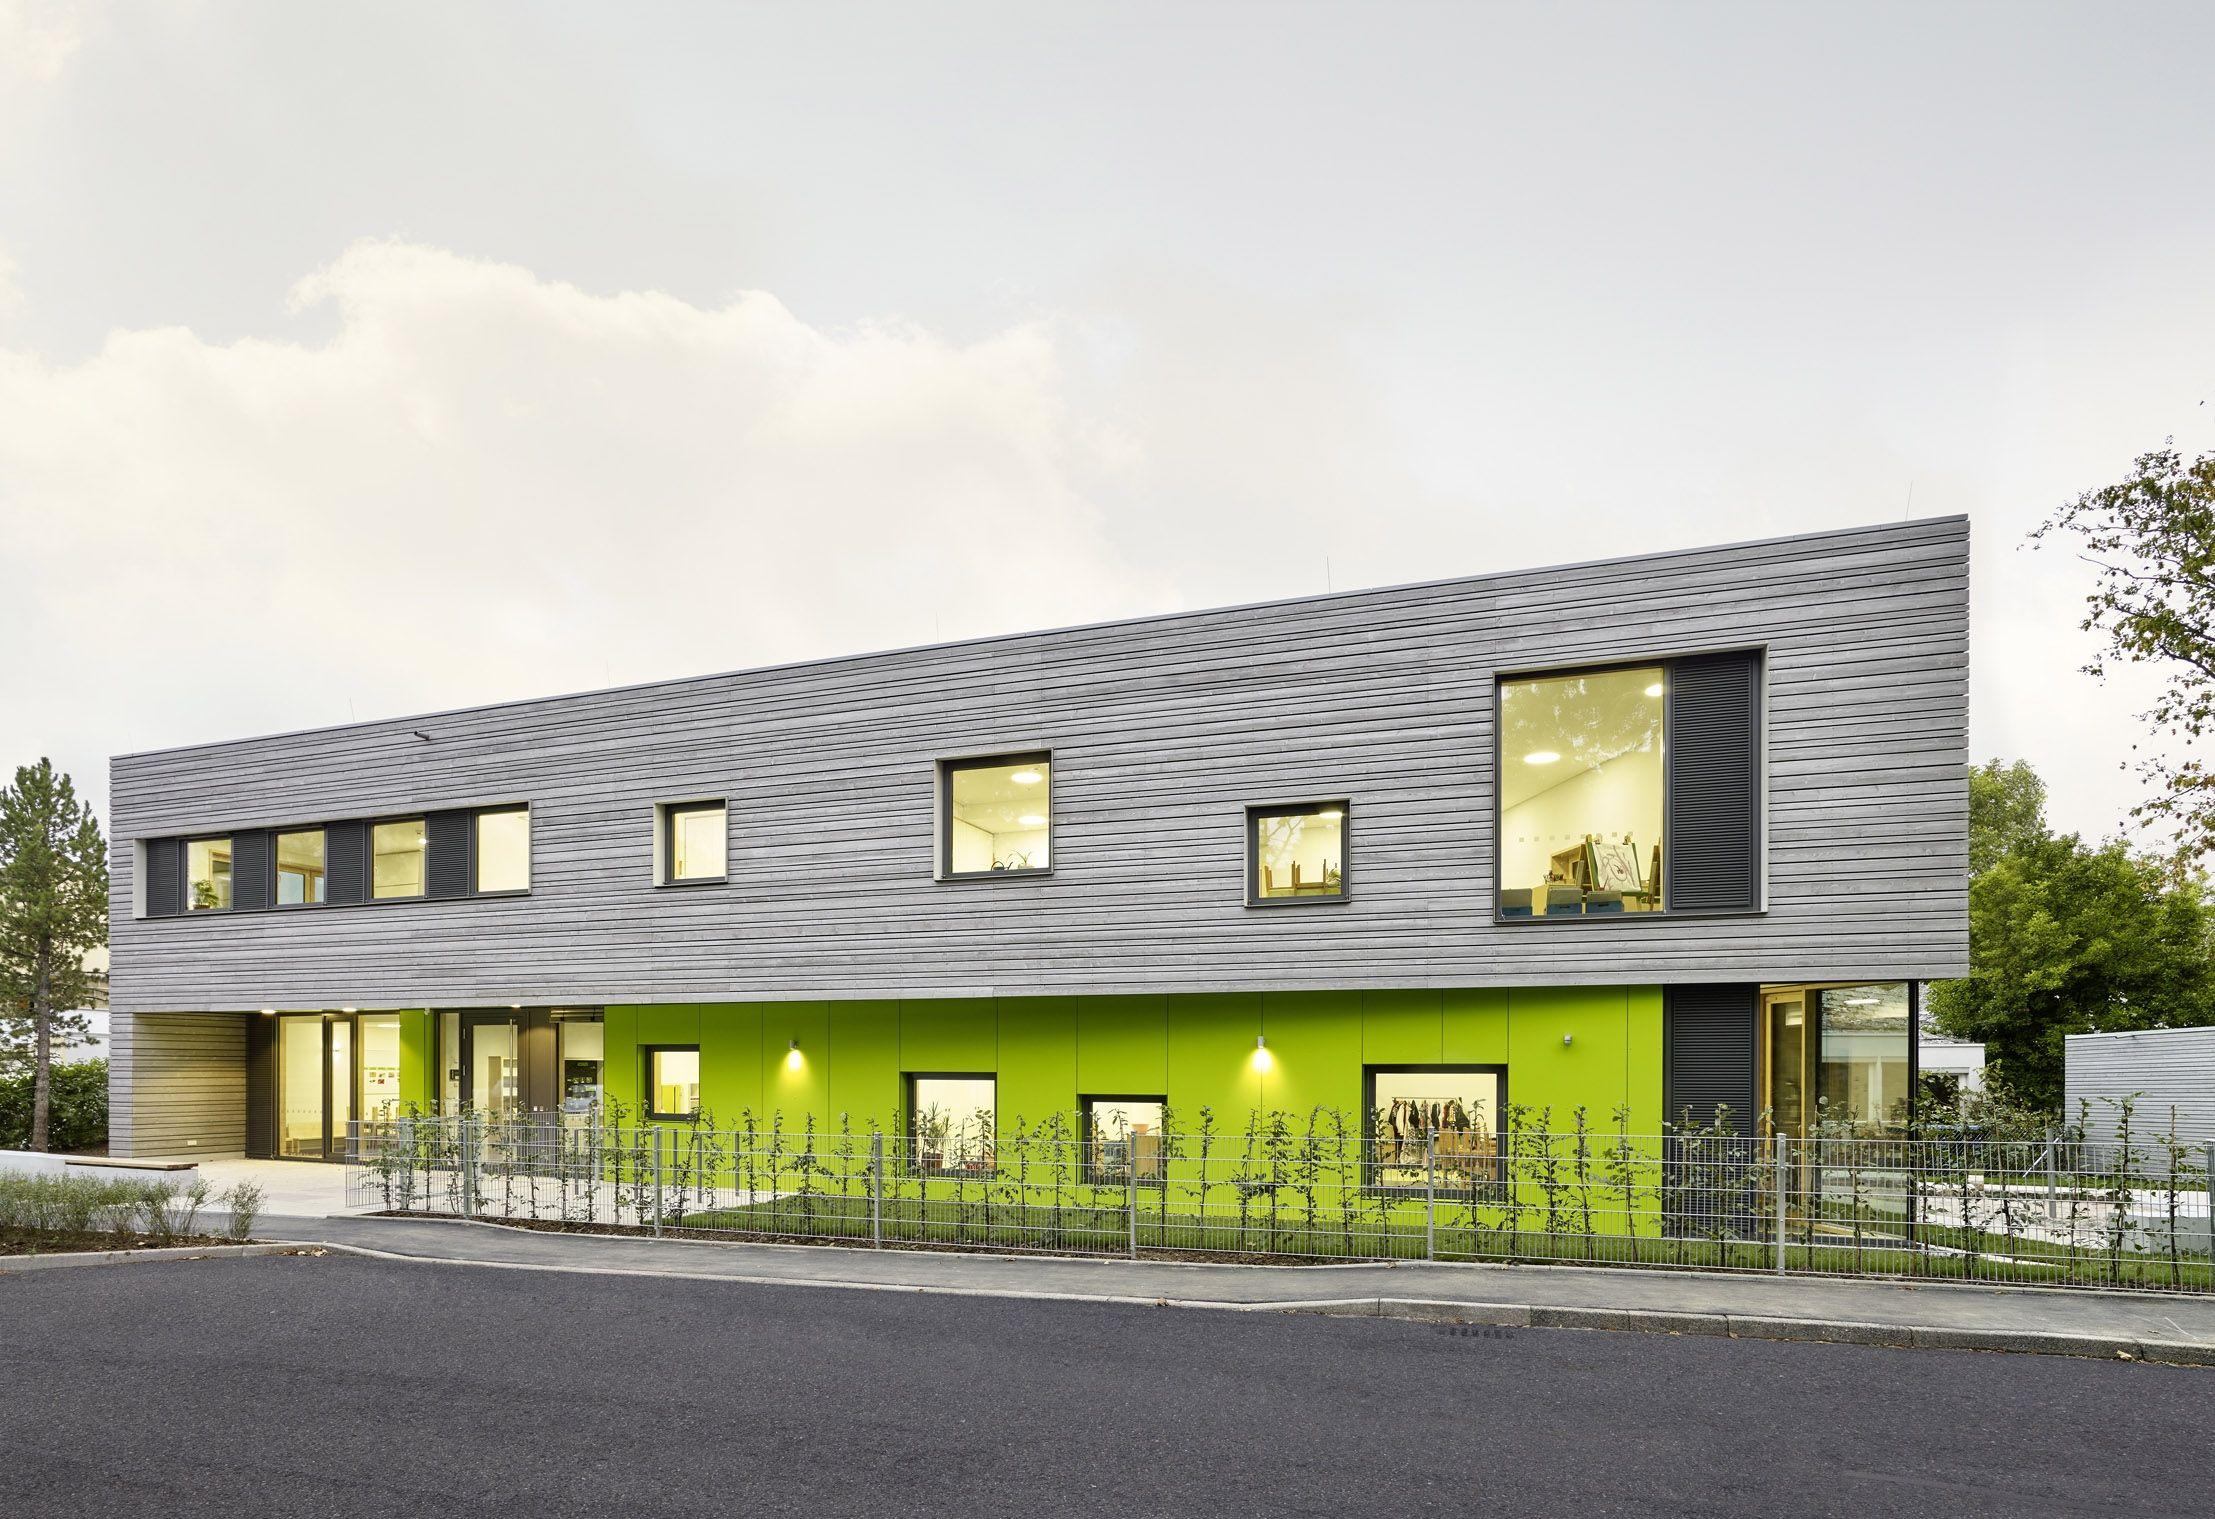 projekt kindergarten lindenlauch competitionline education archi pinterest lojas. Black Bedroom Furniture Sets. Home Design Ideas